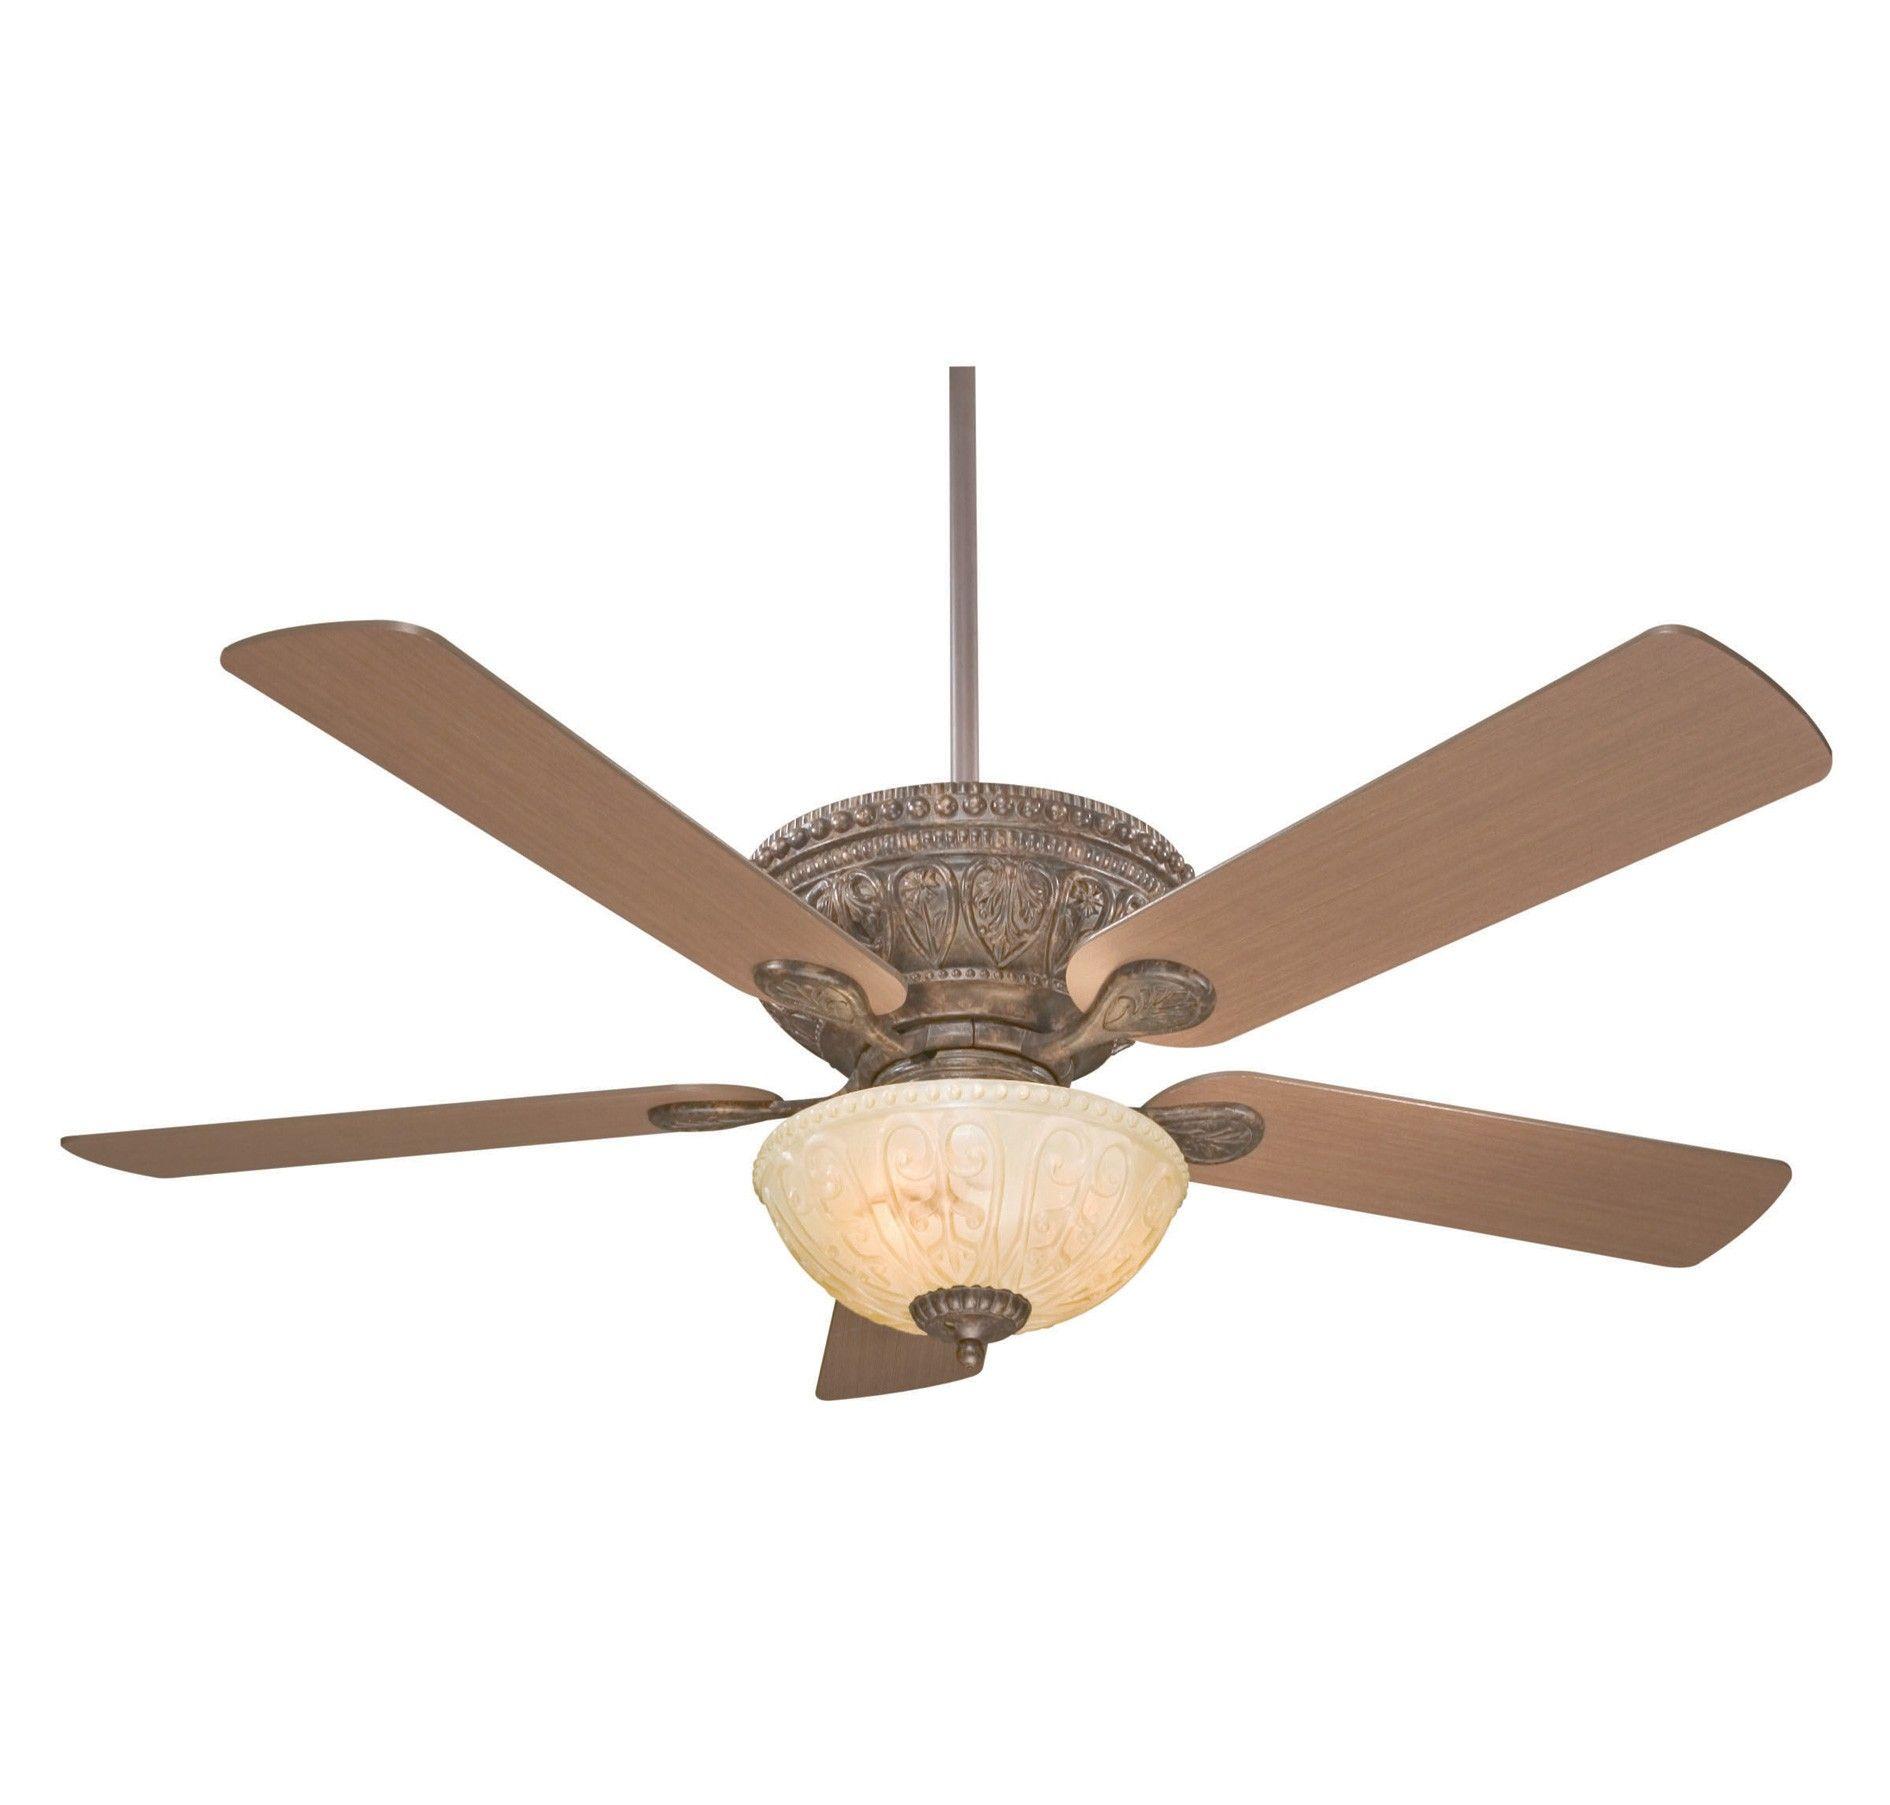 Lee Lighting Savoy House Ceiling Fan I